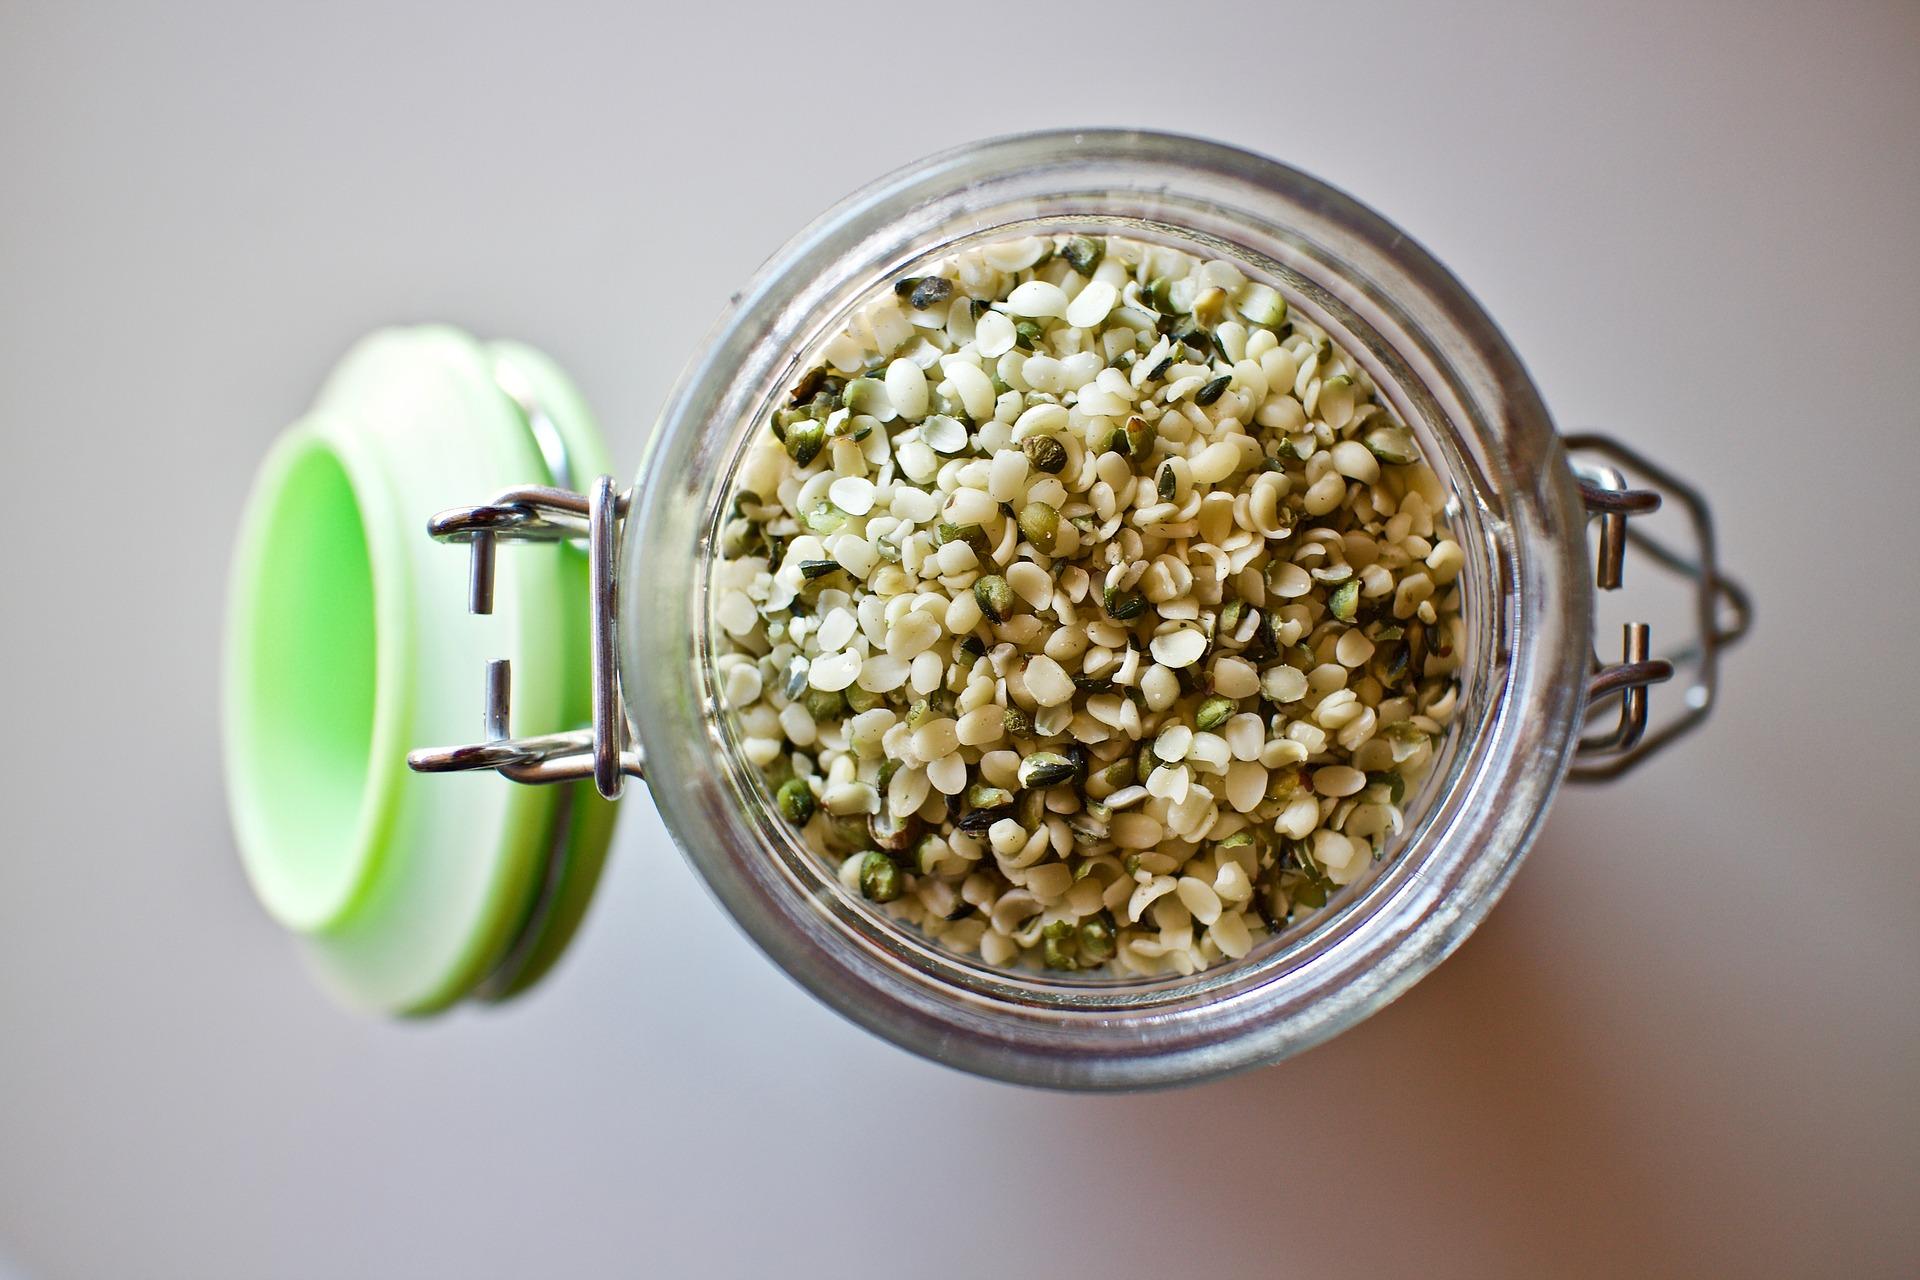 Benefits of hemp seeds, hemp seeds omega 3 6 9, hemp protein